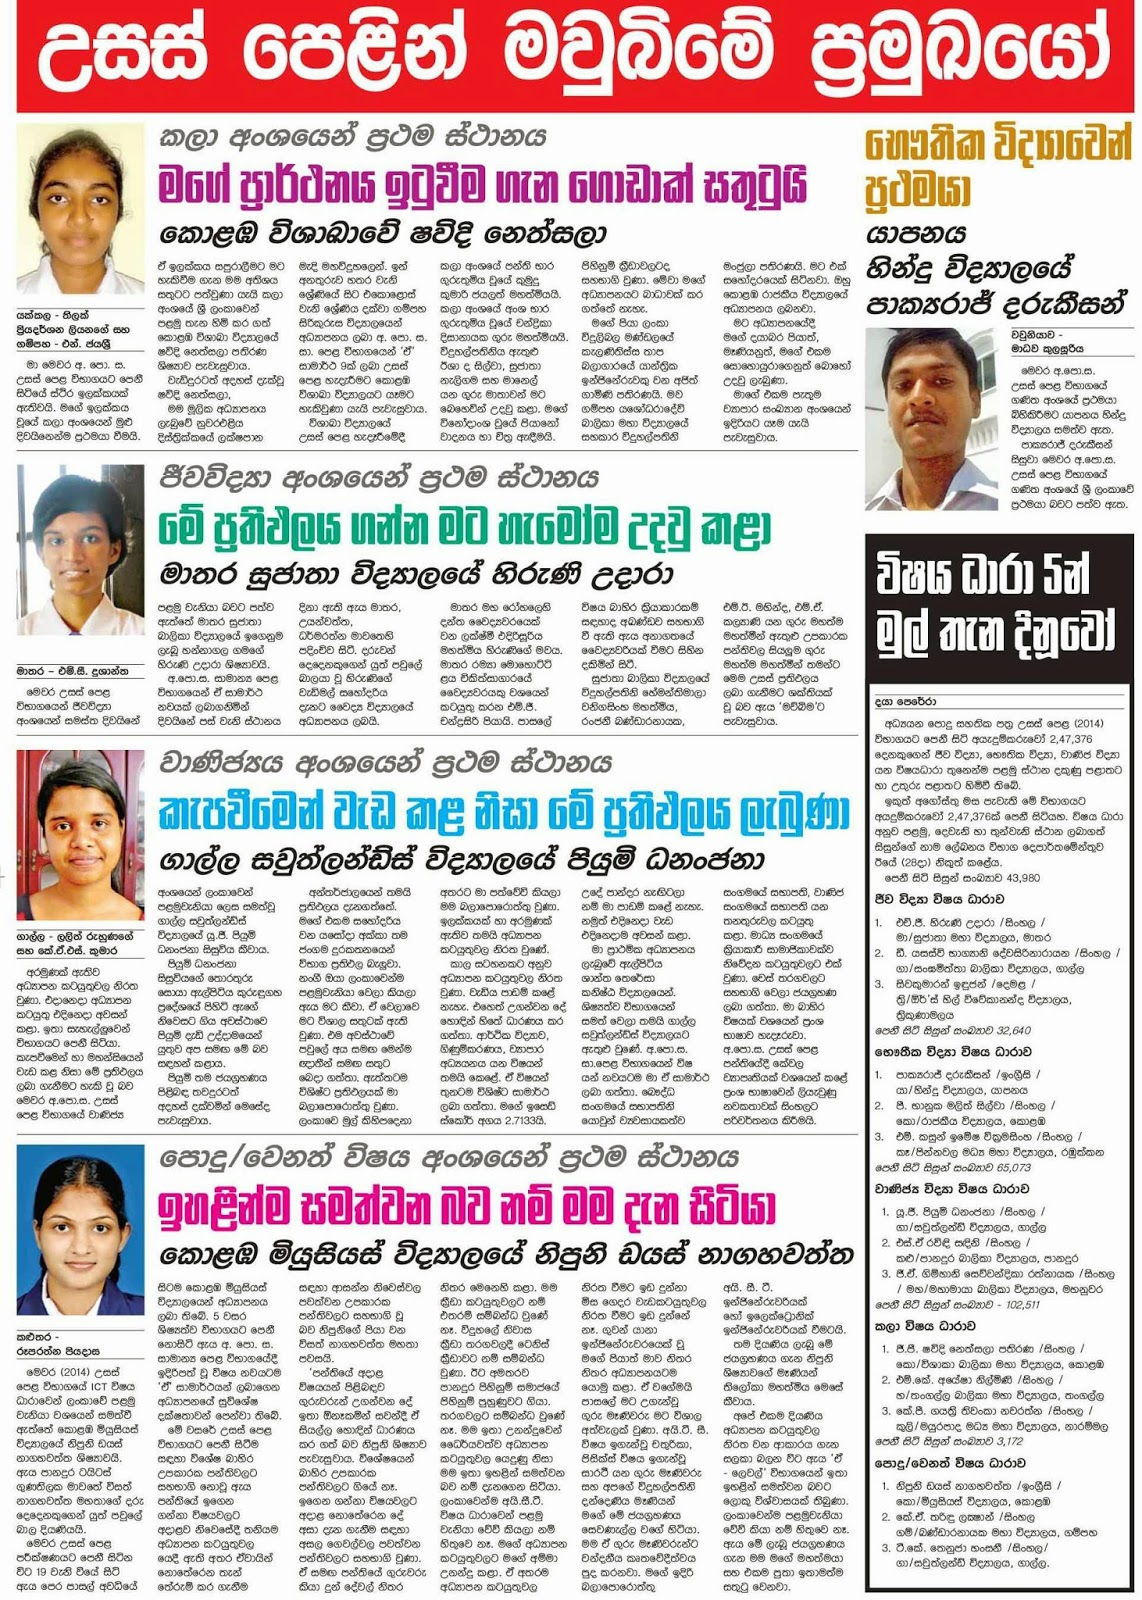 http://papper.gossiplankahotnews.com/2014/12/al-island-best-students.html